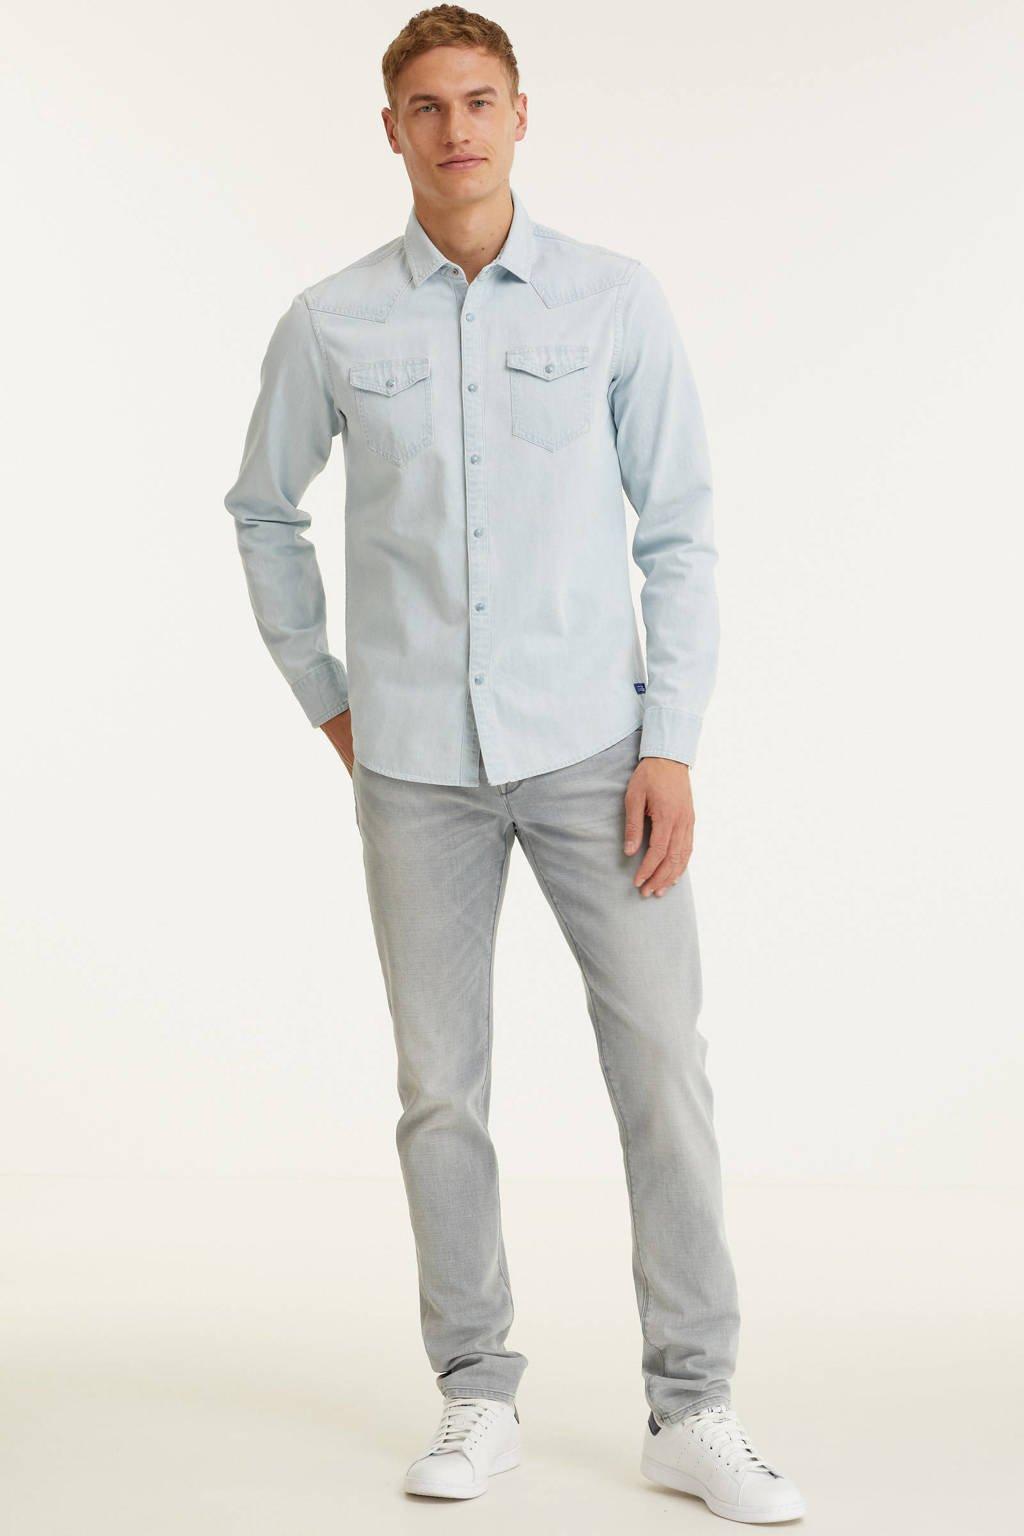 Vanguard slim fit jeans V7 lgc, LGC